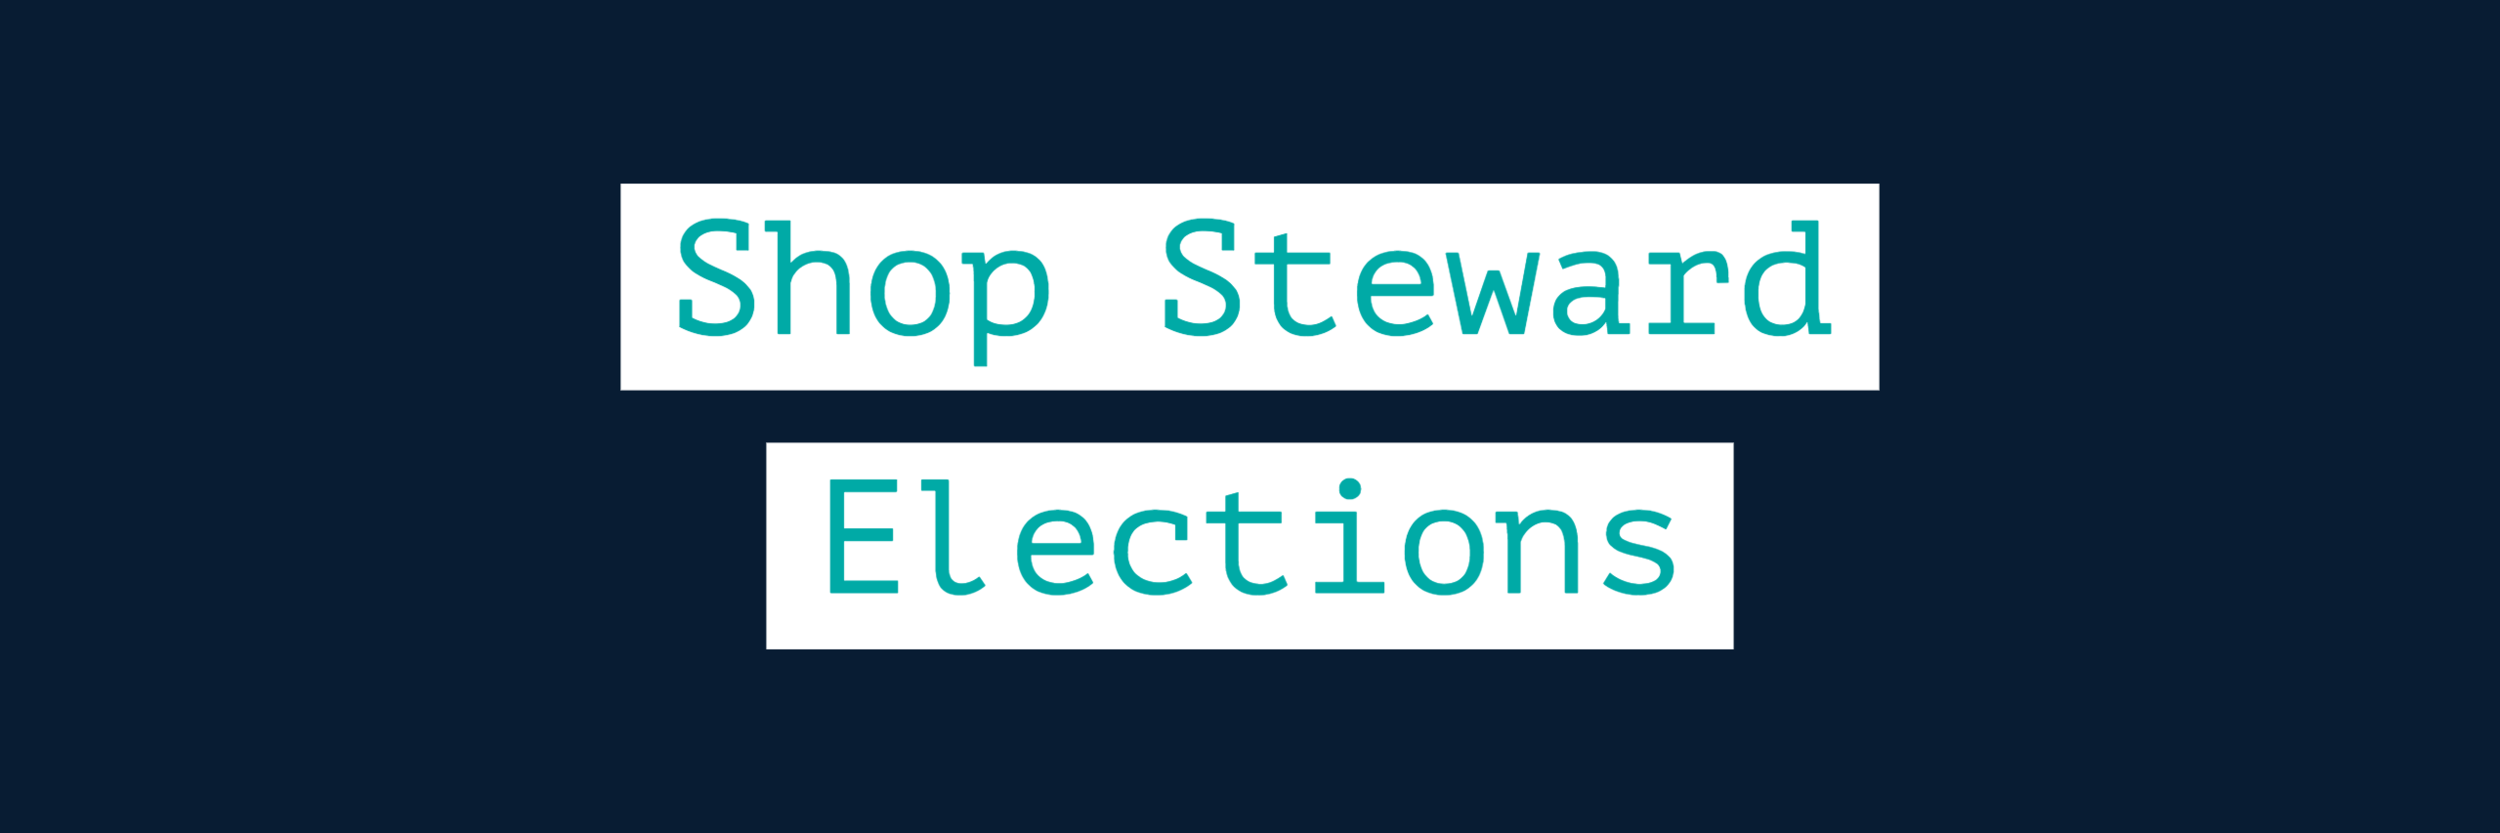 Shop Steward Elections (2).png